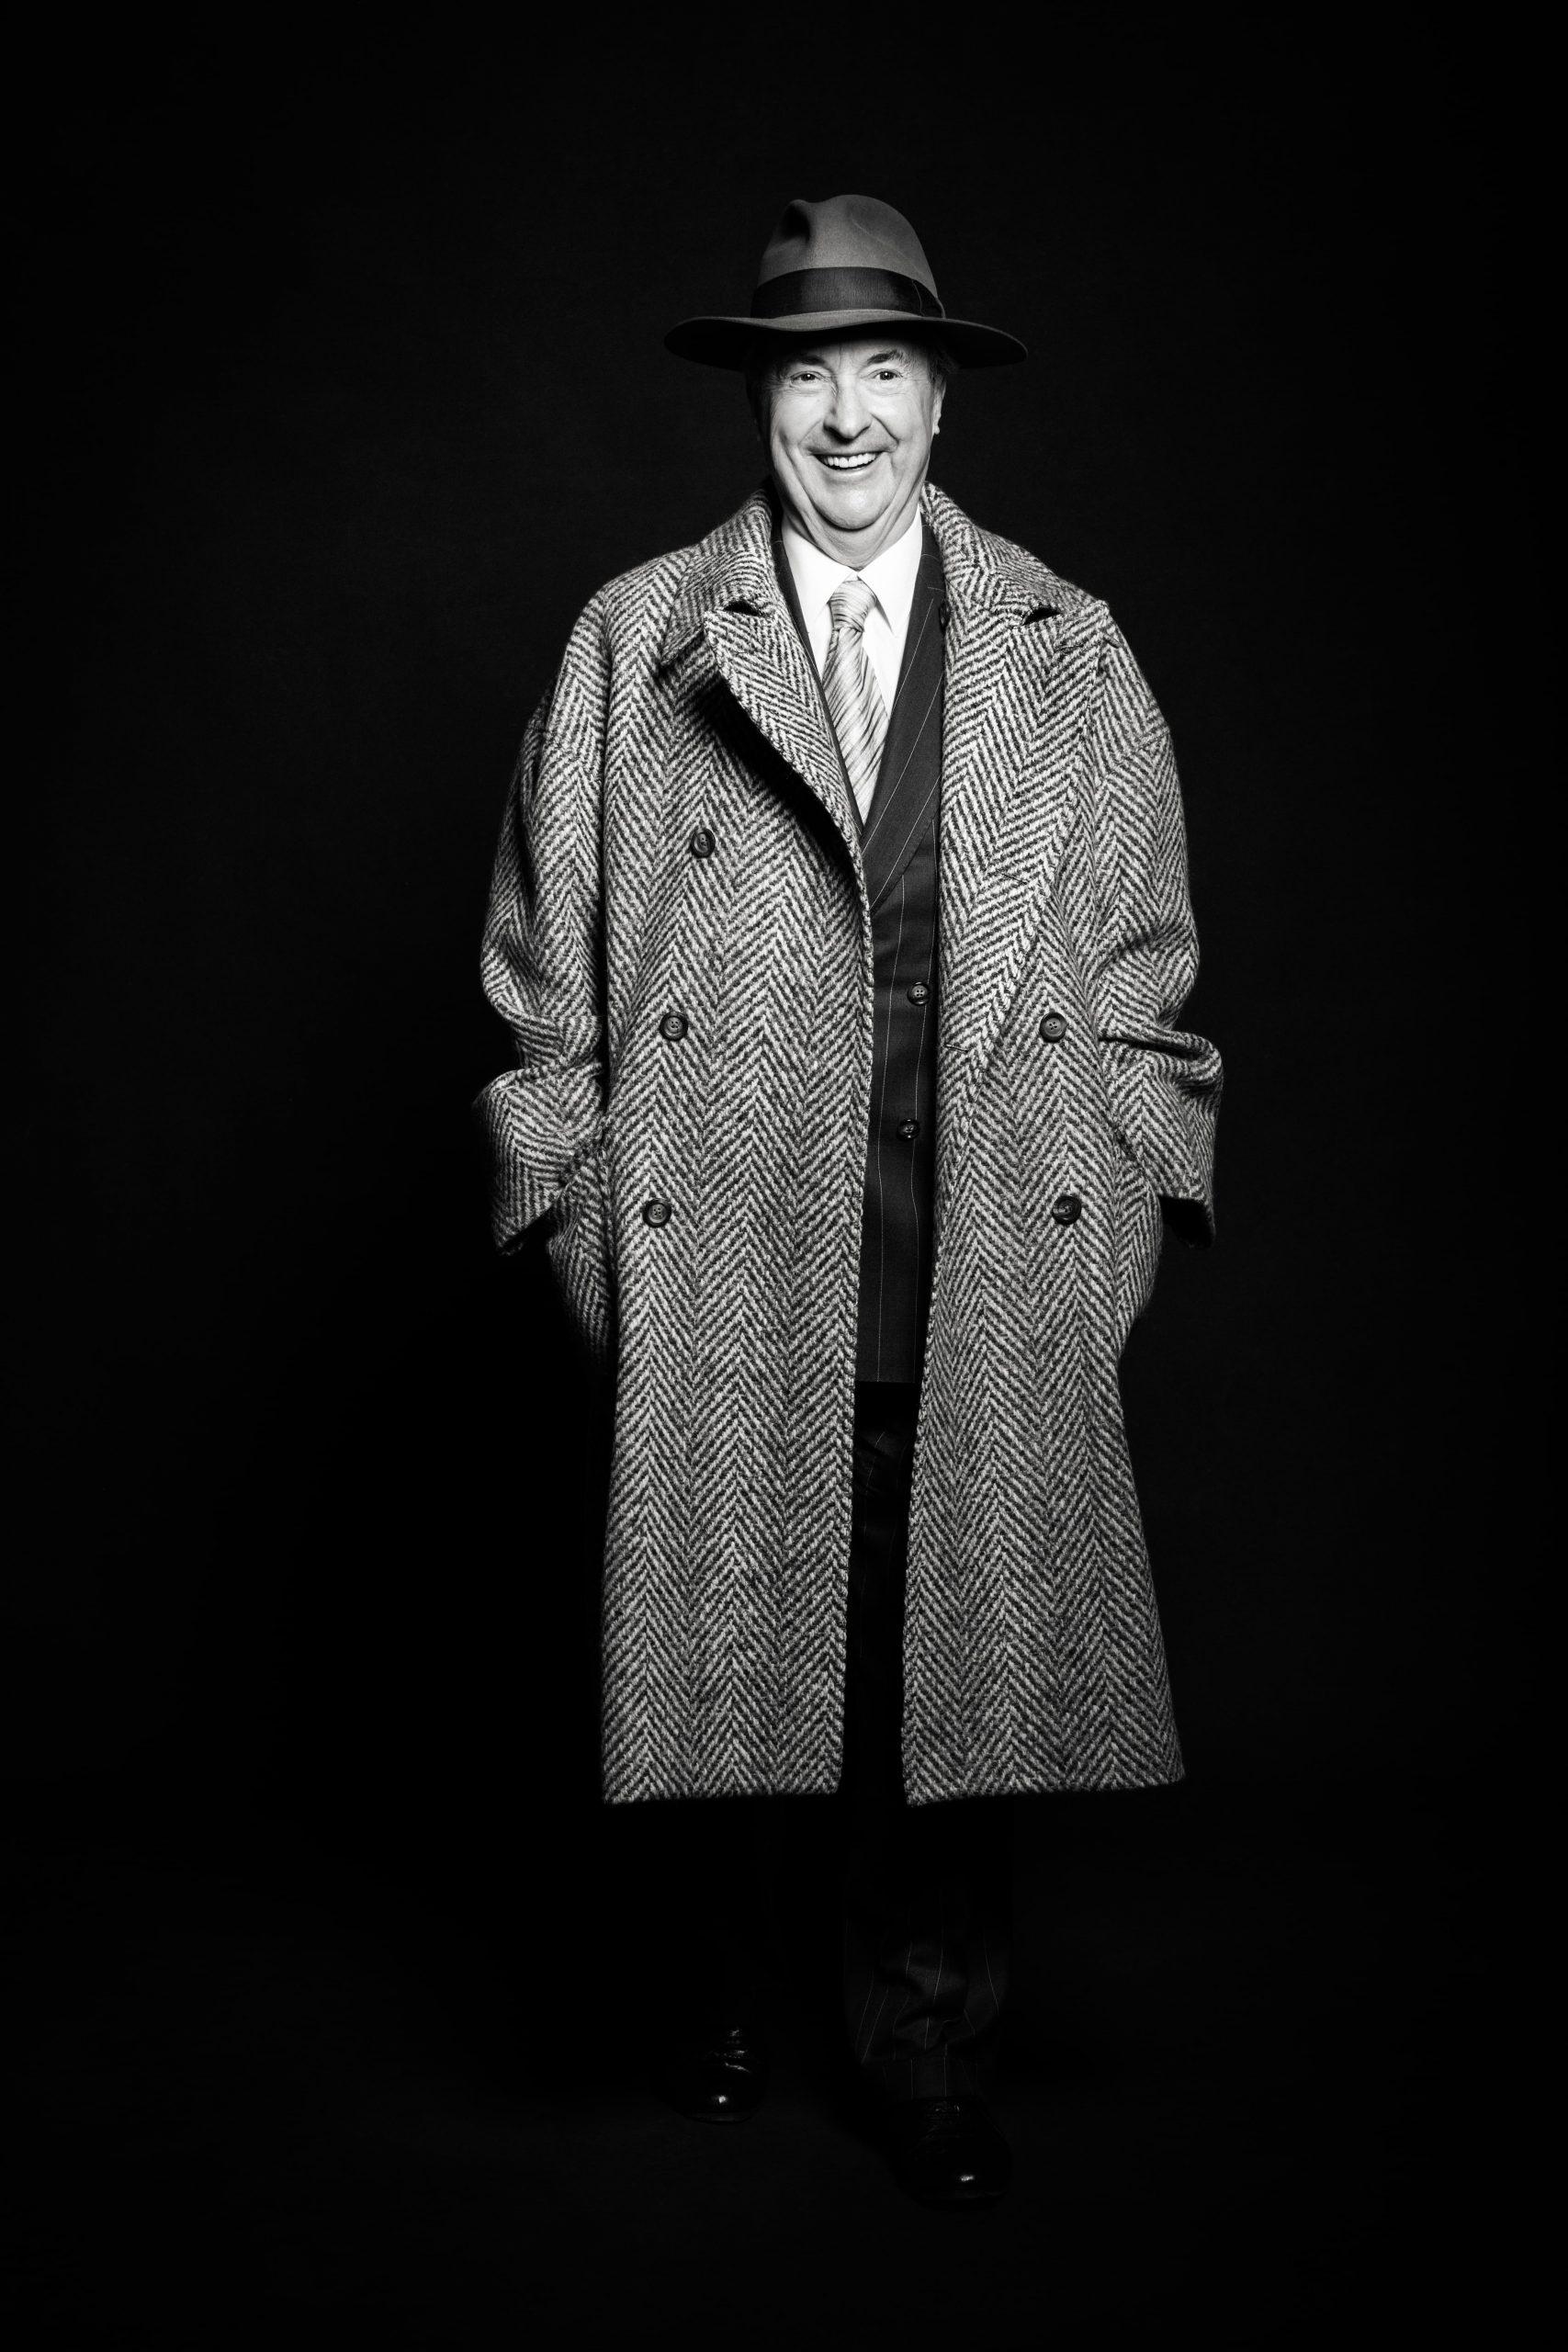 David McAlpine